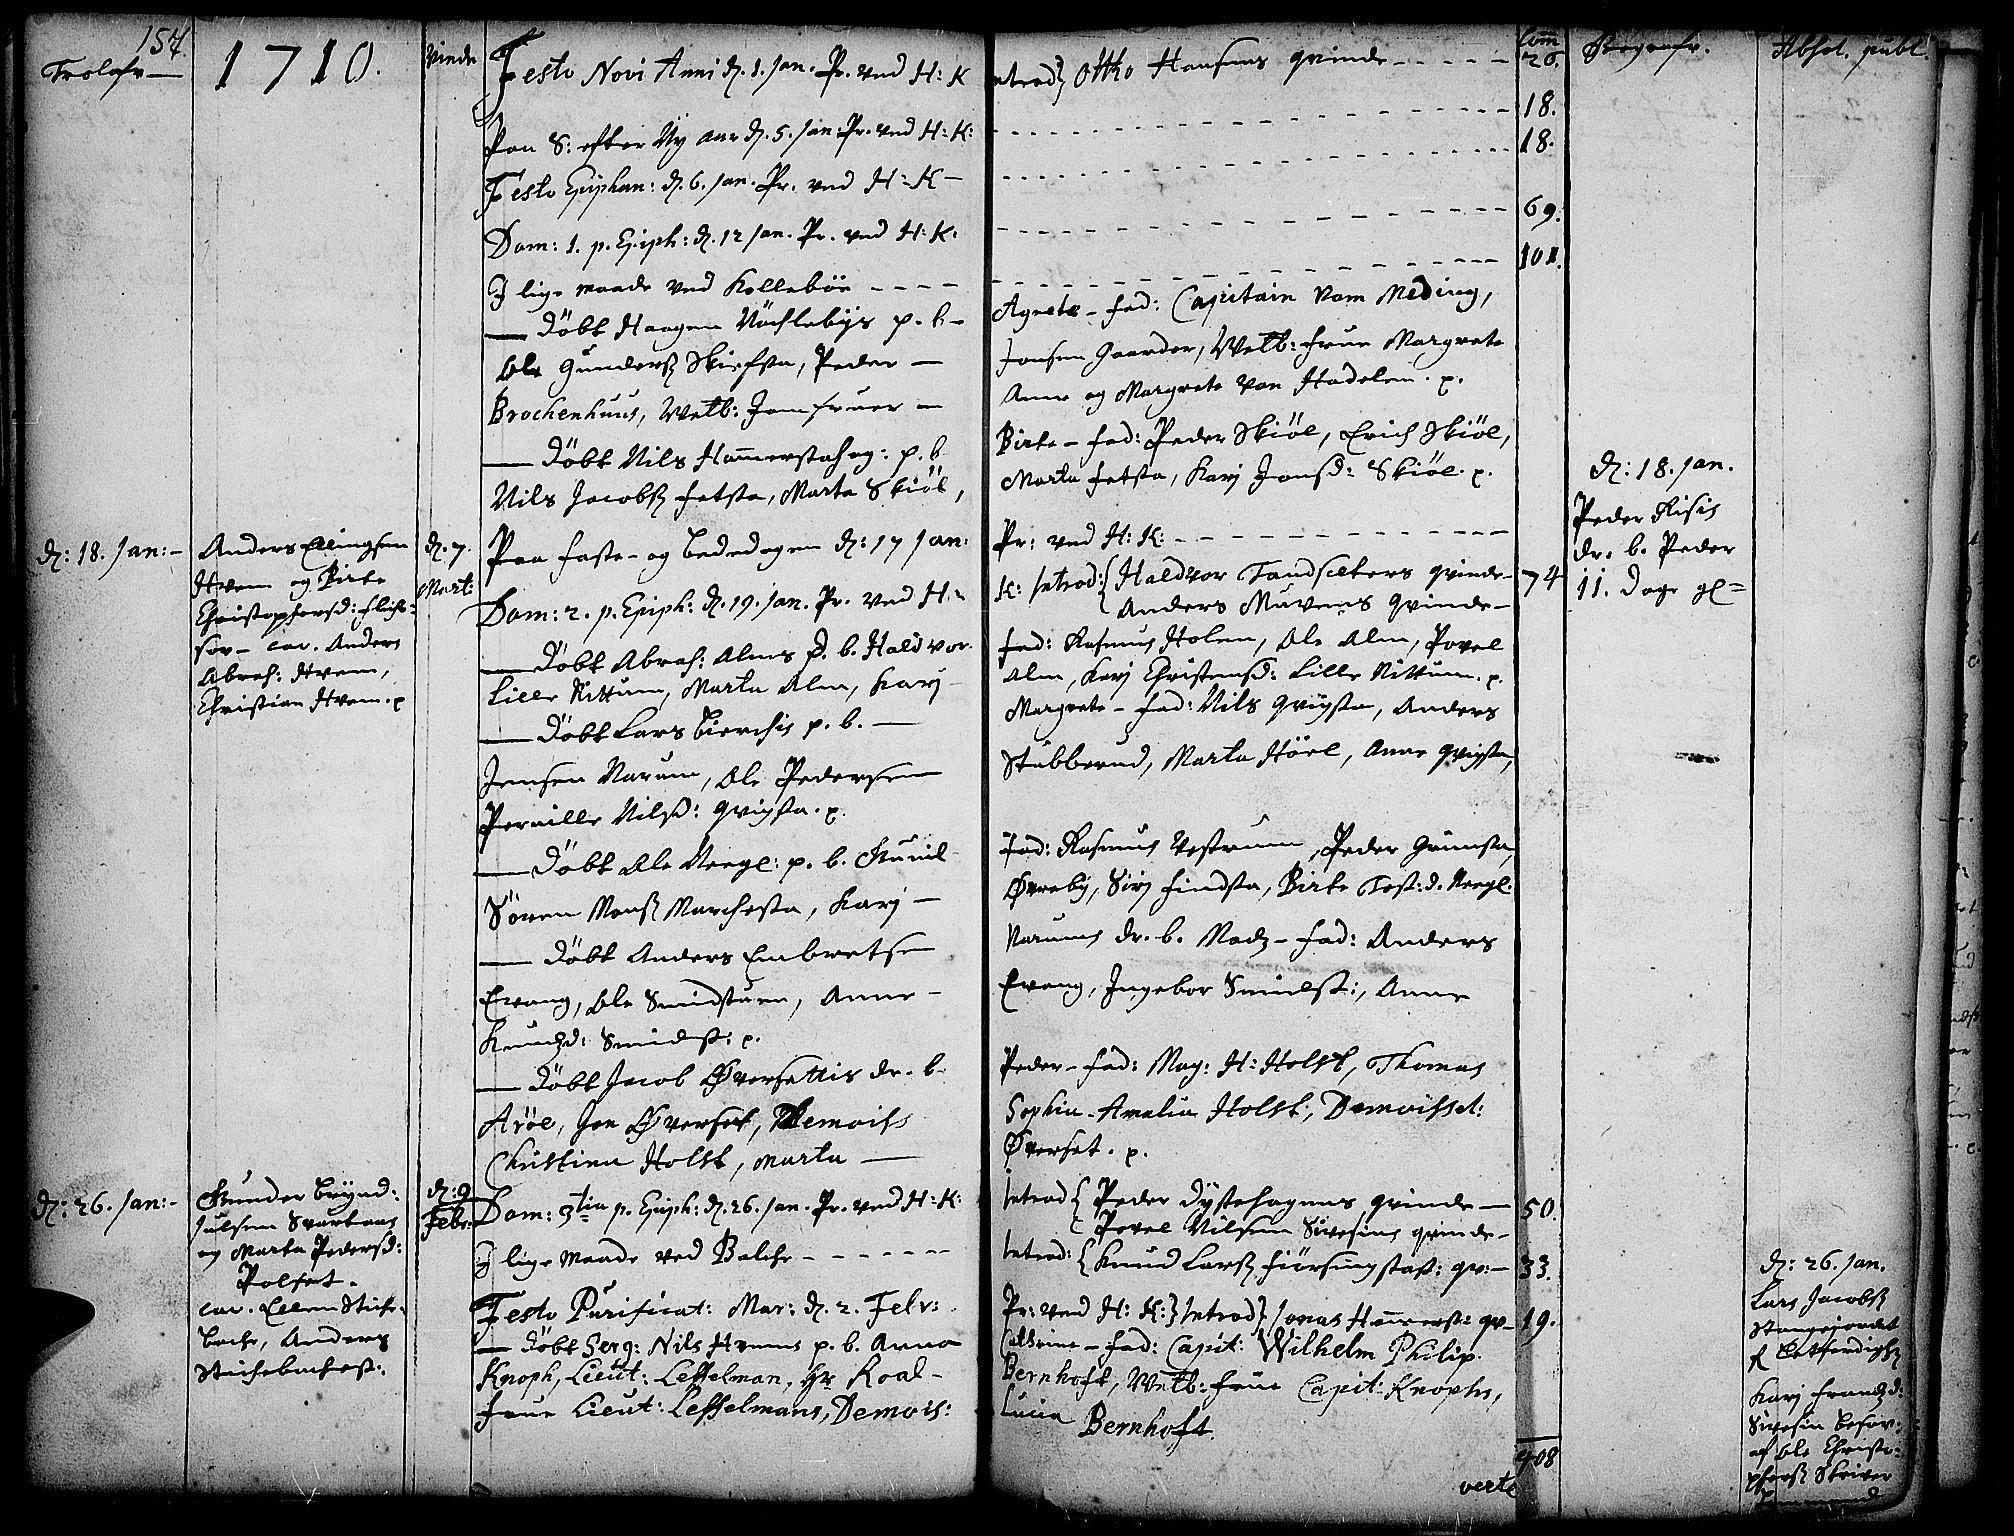 SAH, Toten prestekontor, Ministerialbok nr. 1, 1695-1713, s. 157